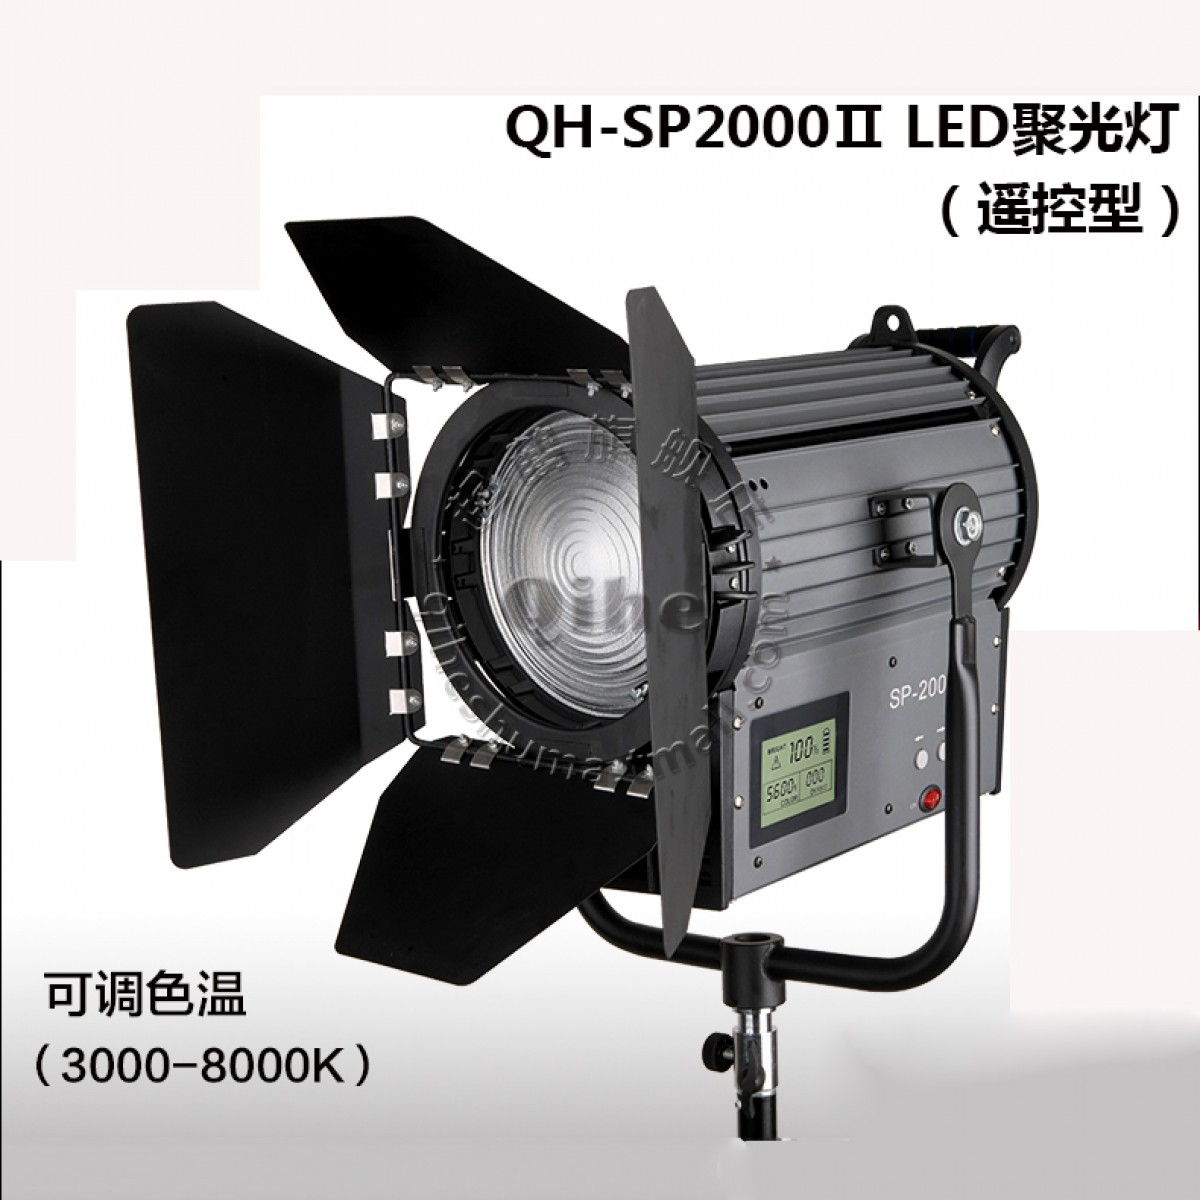 Qihe起鹤牌QH-SP2000ⅡLED聚光灯 遥控影视灯